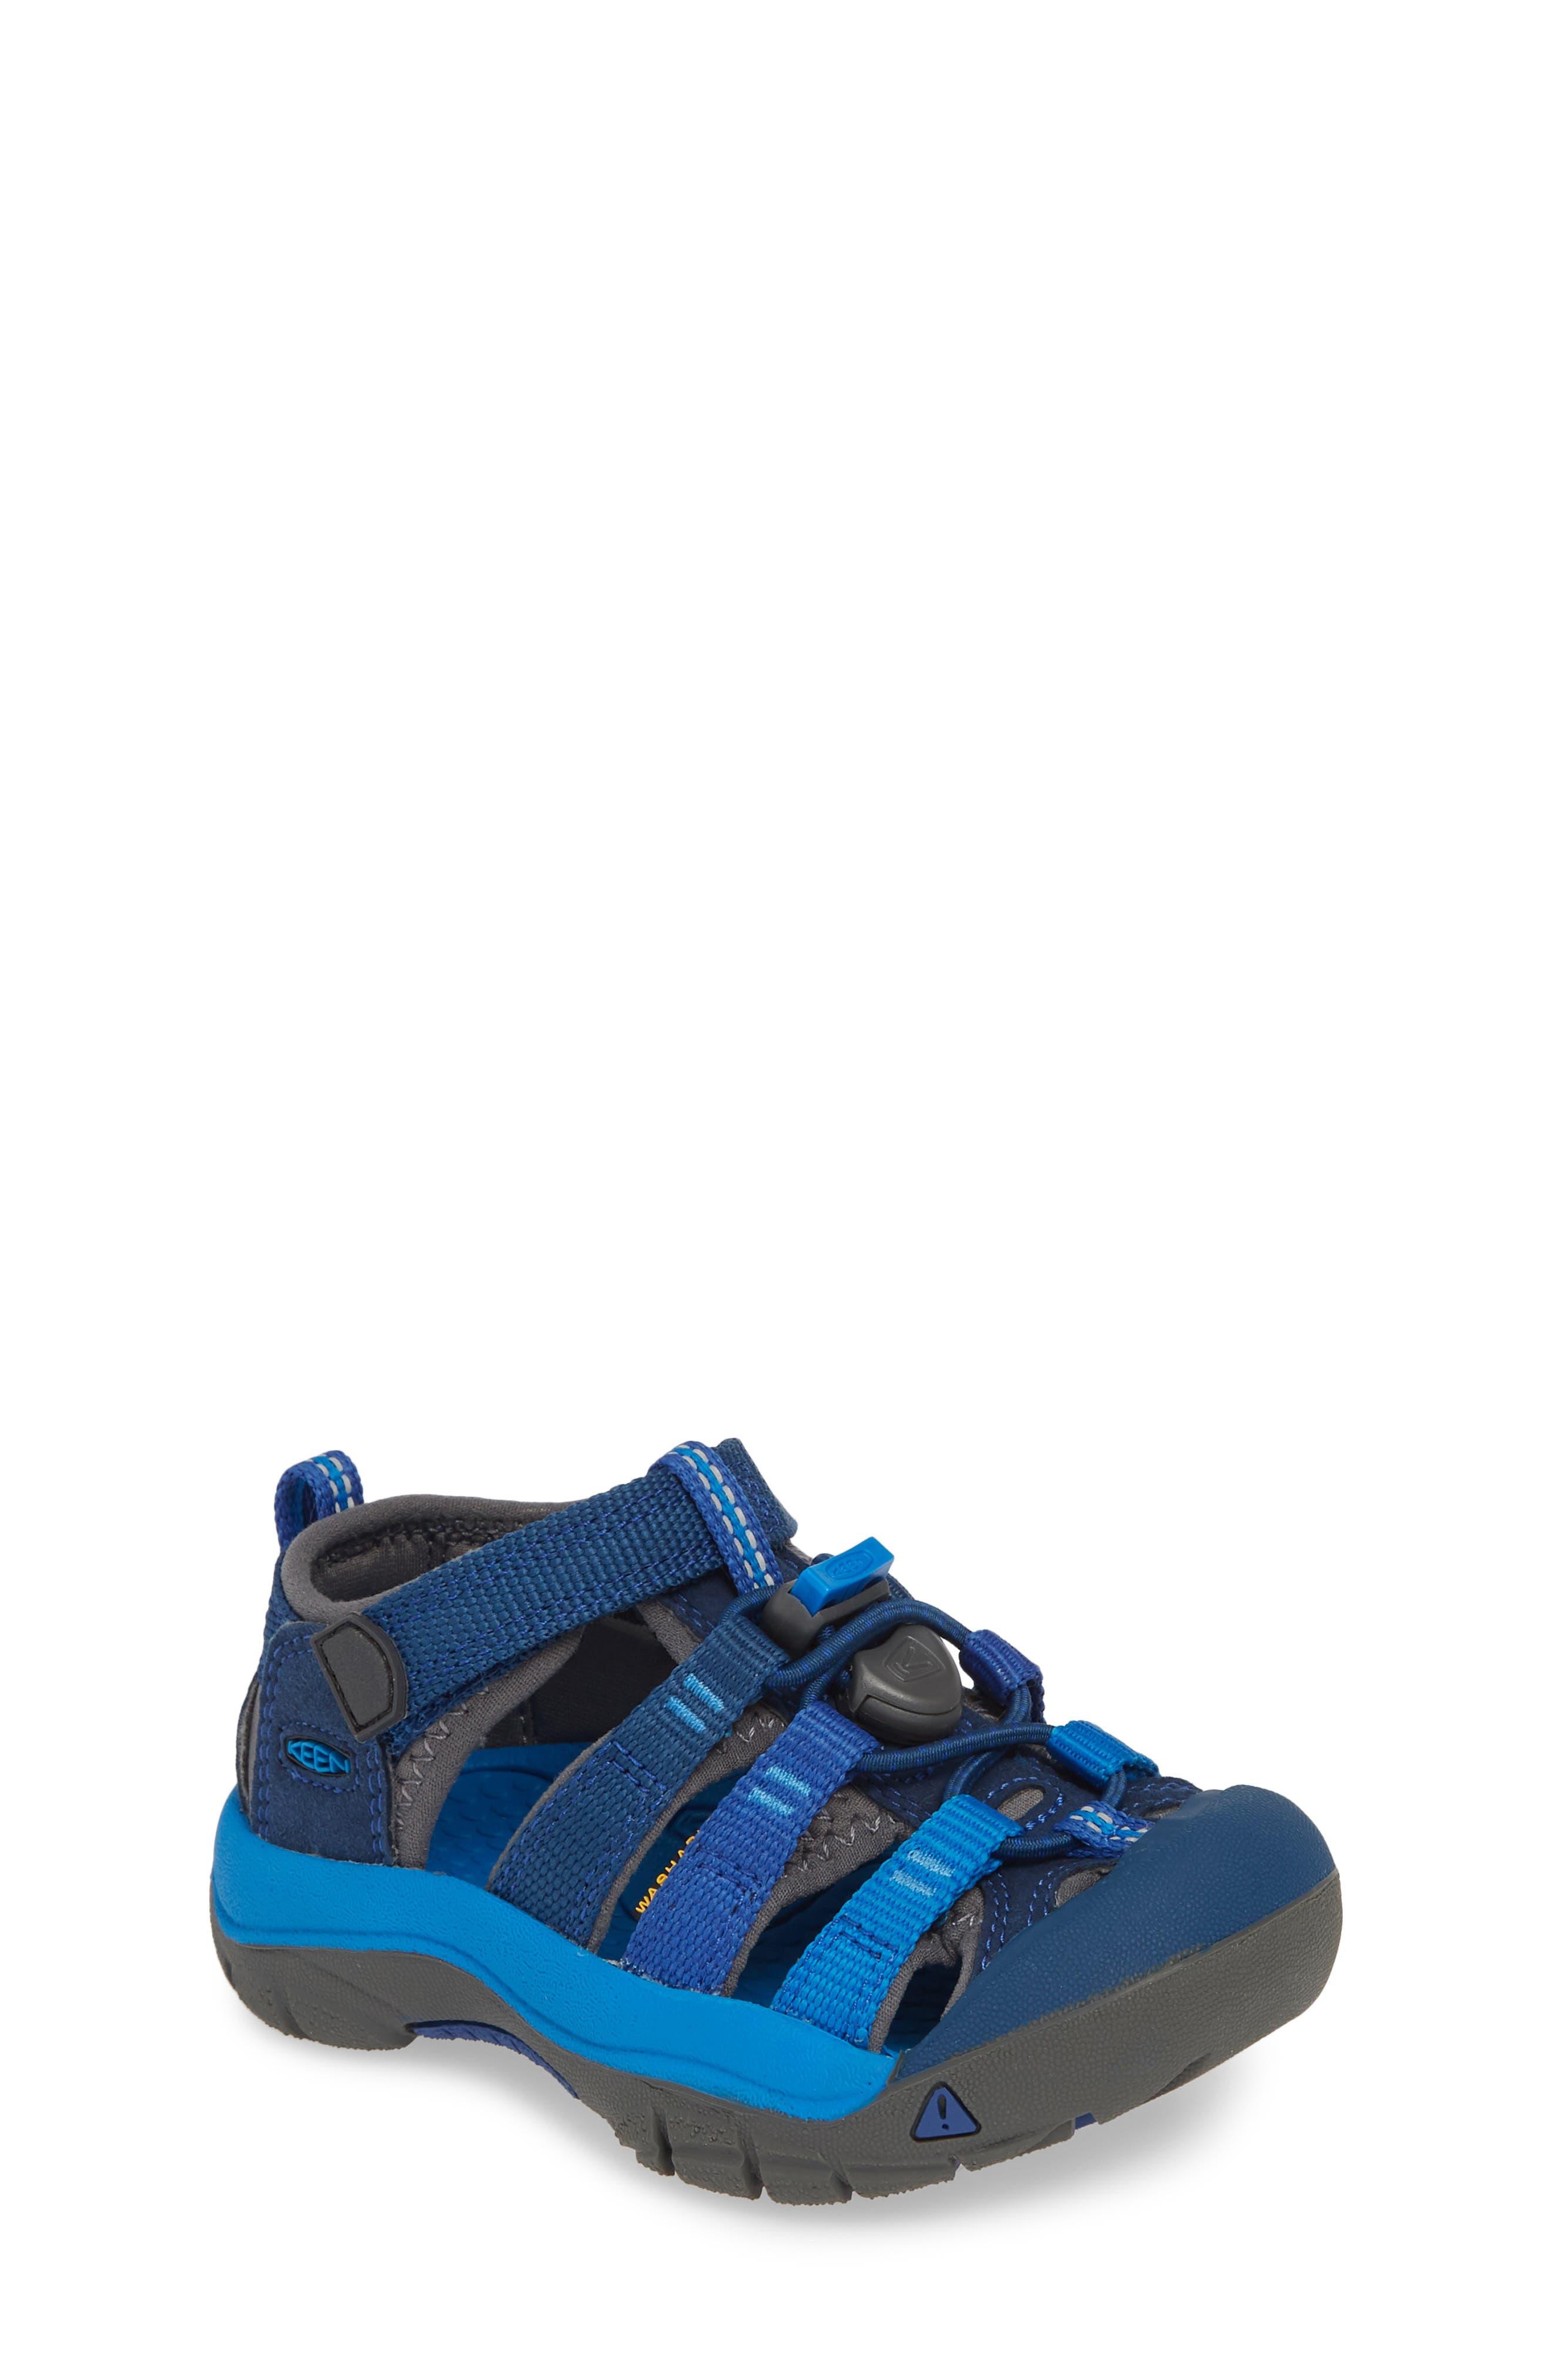 Toddler Keen Newport H2 Water Friendly Sandal Size 2 M  Blue